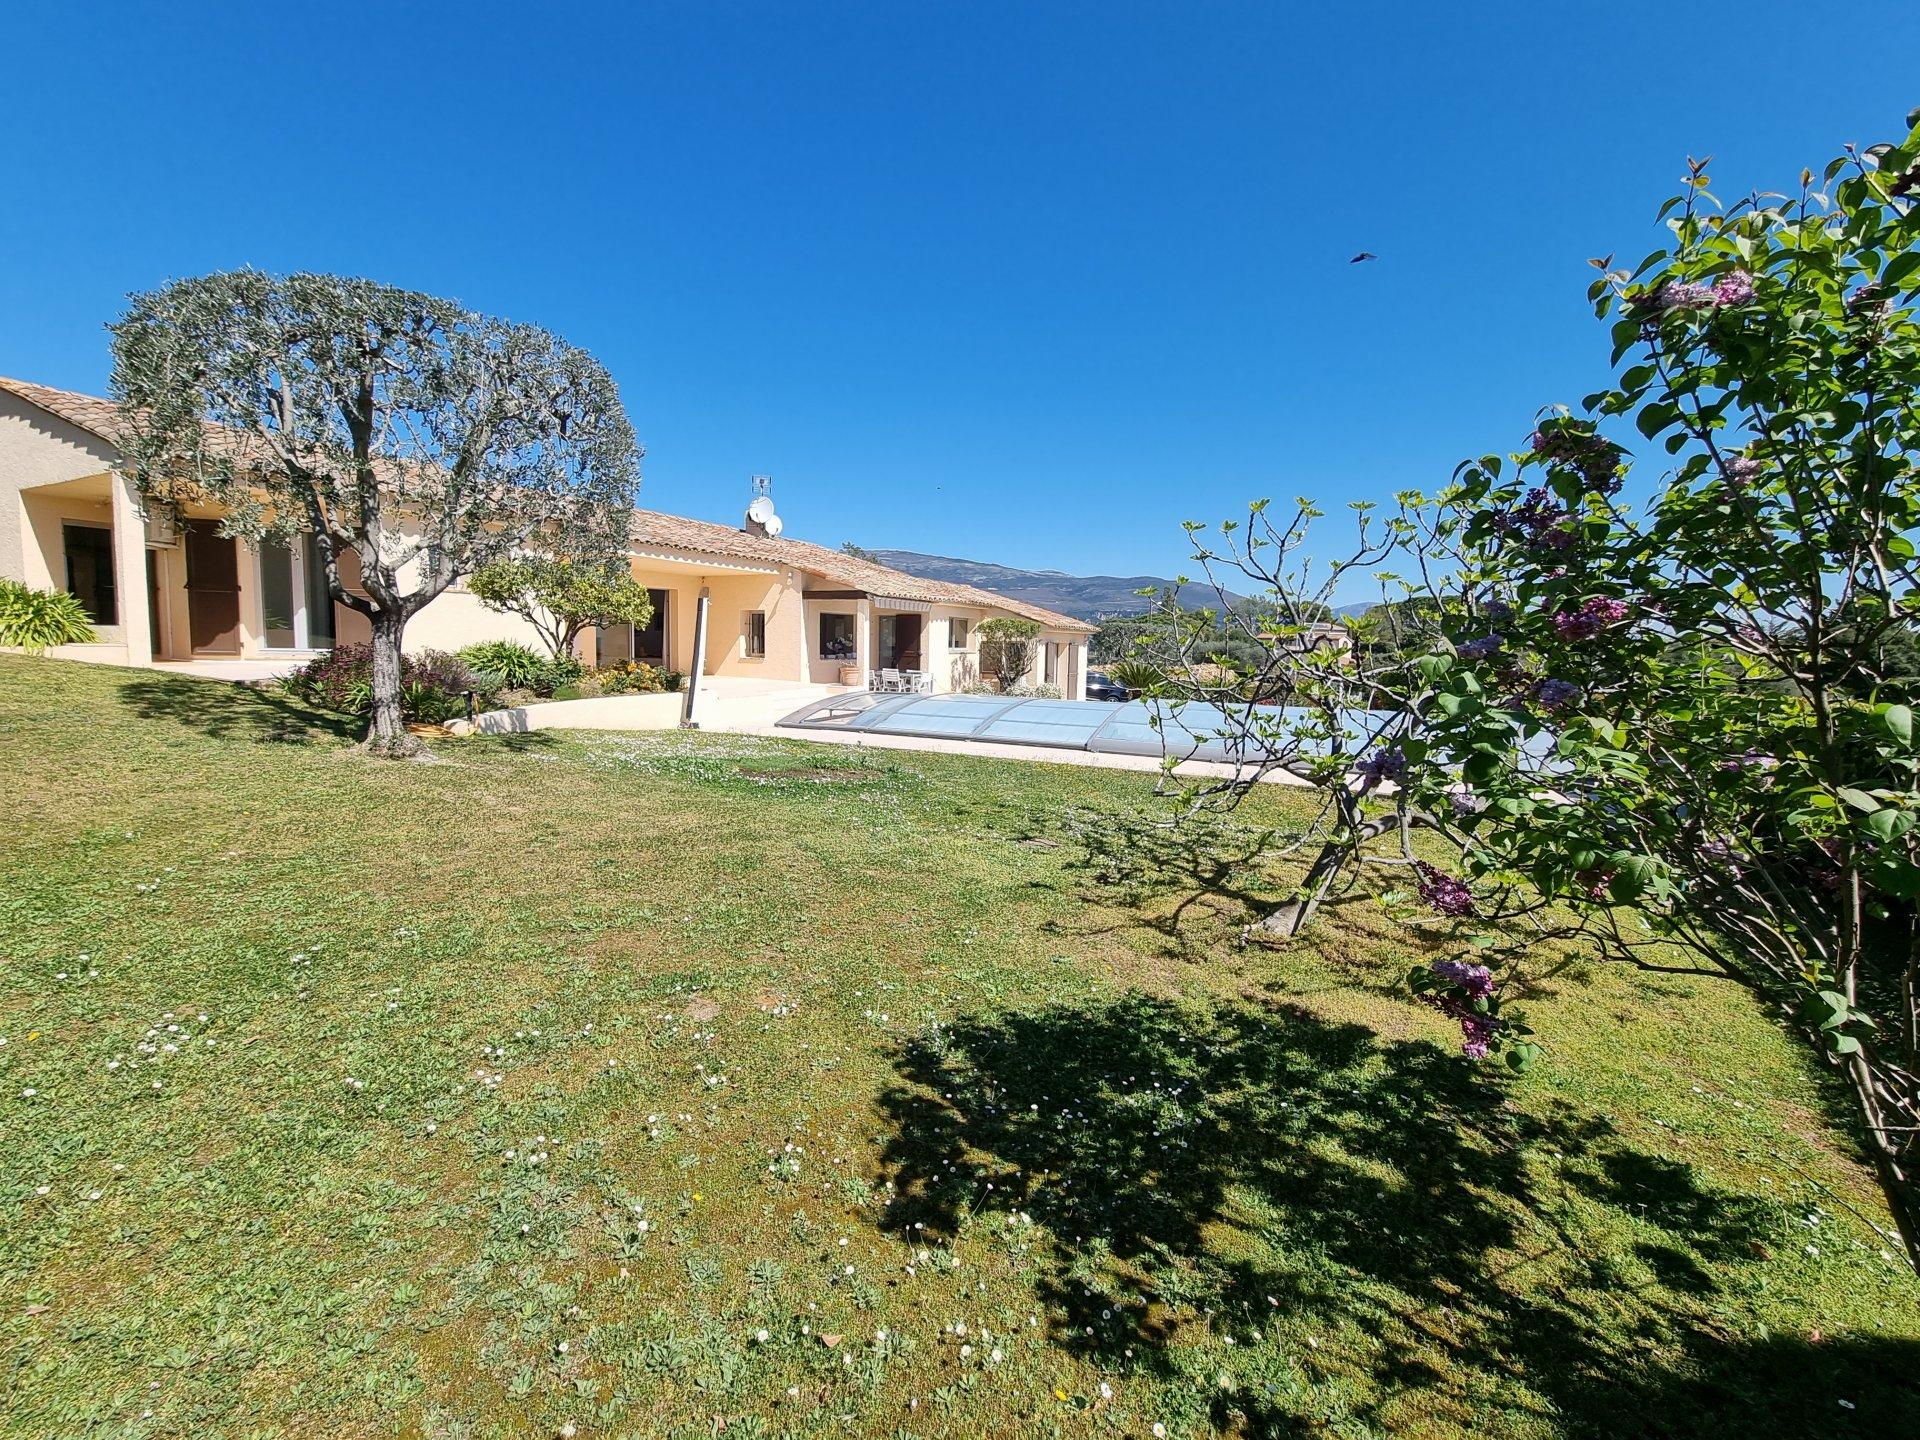 Vente villa vue panoramique mer, à Peymeinade.